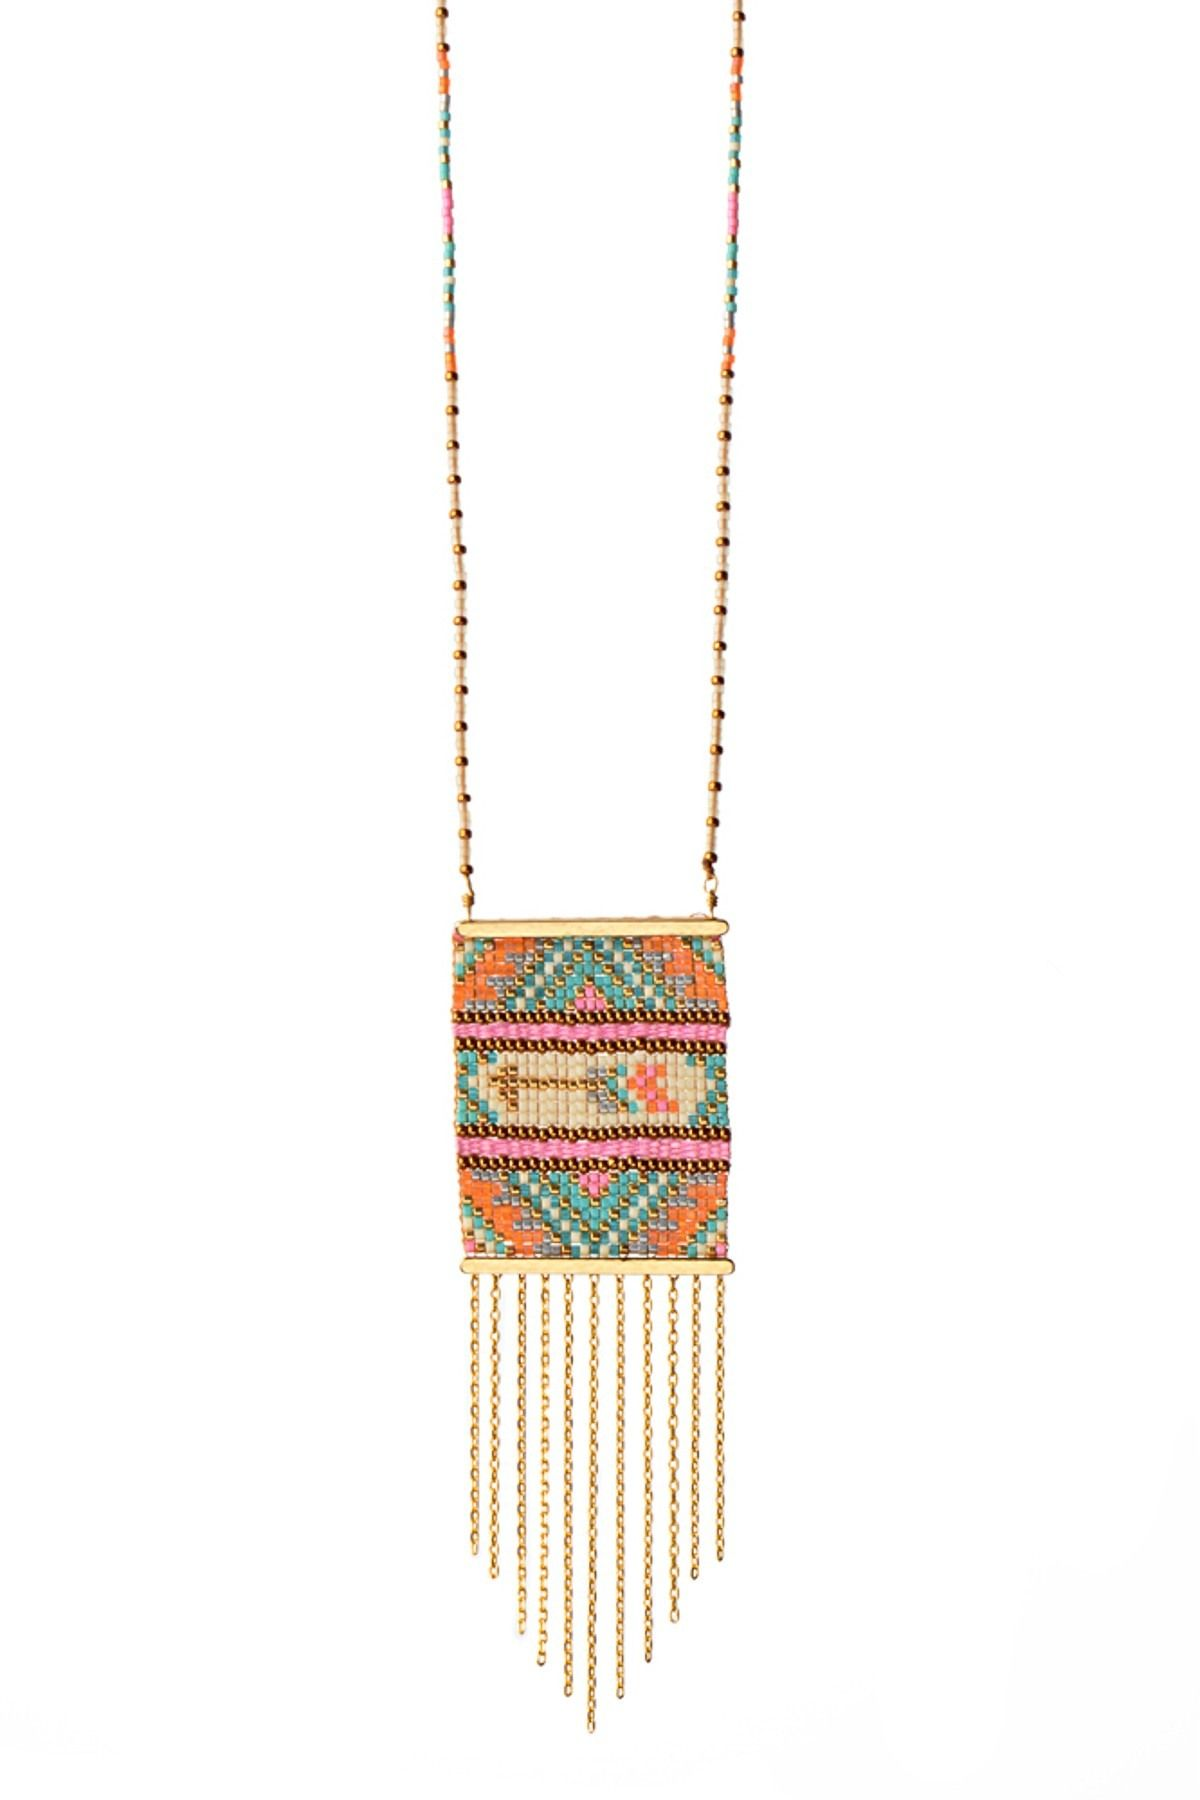 Zumba Necklace-GP-L